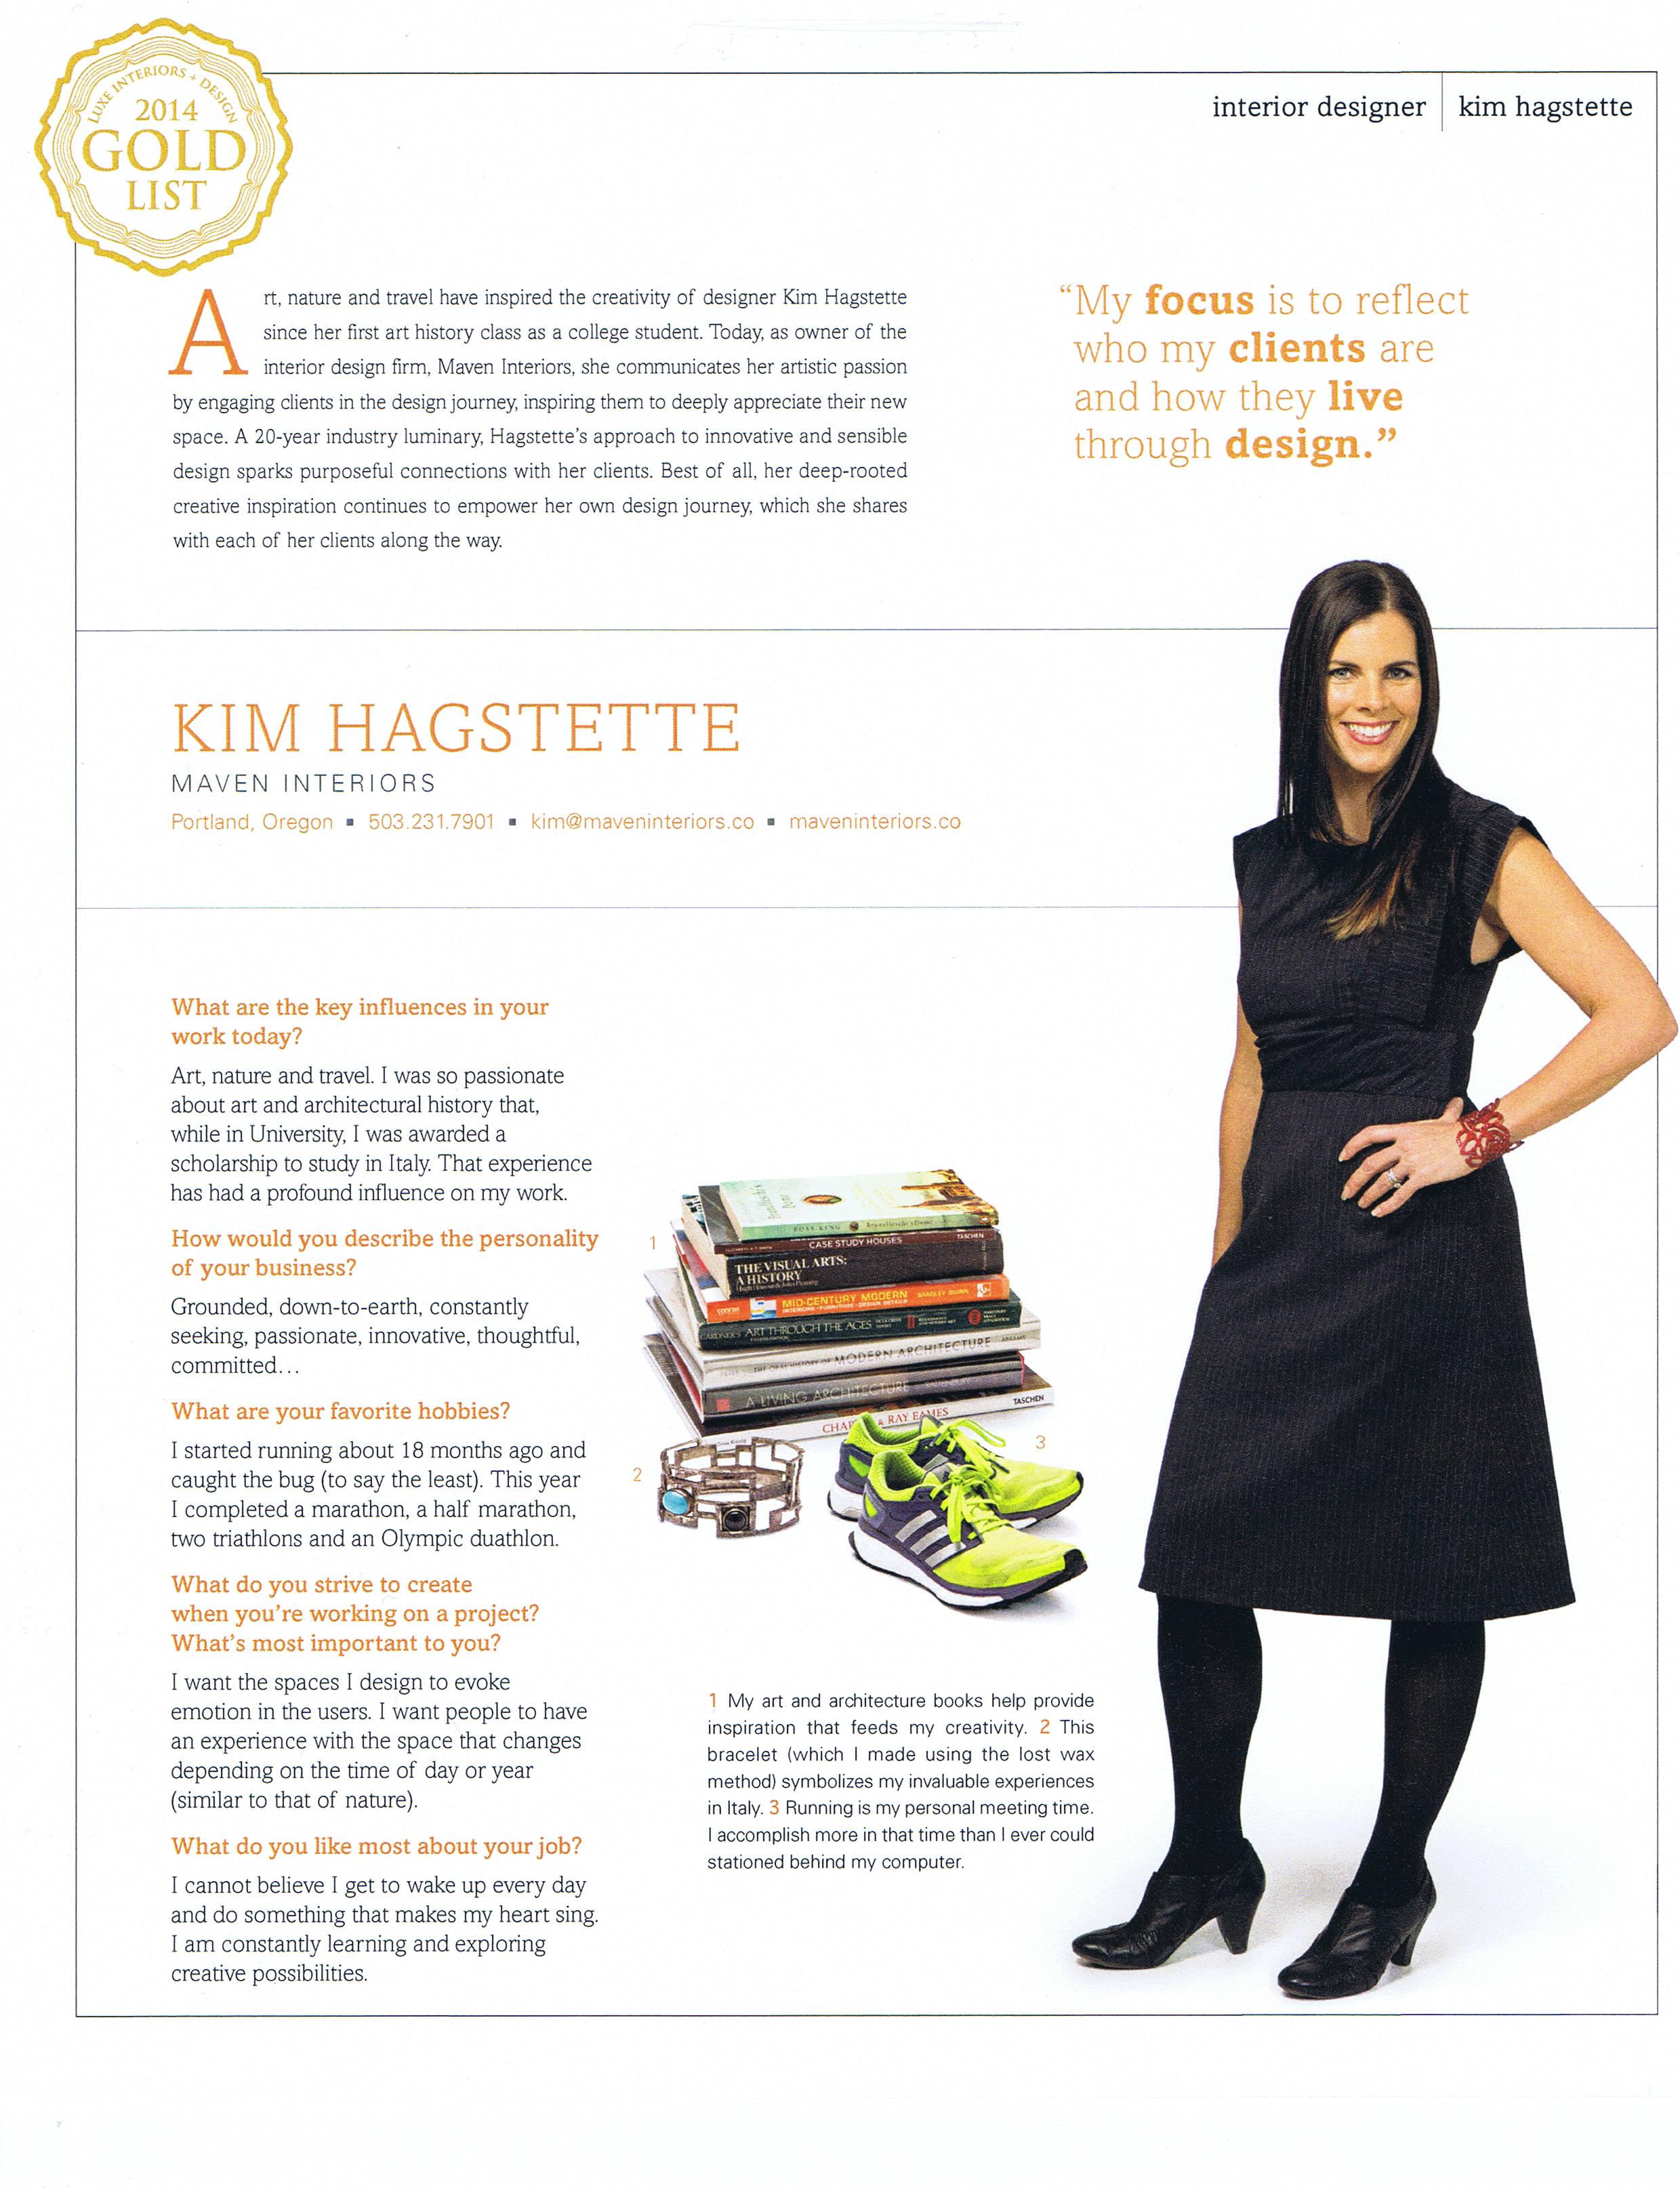 Kim Hagstette Luxe Gold List Profile 2014.jpg